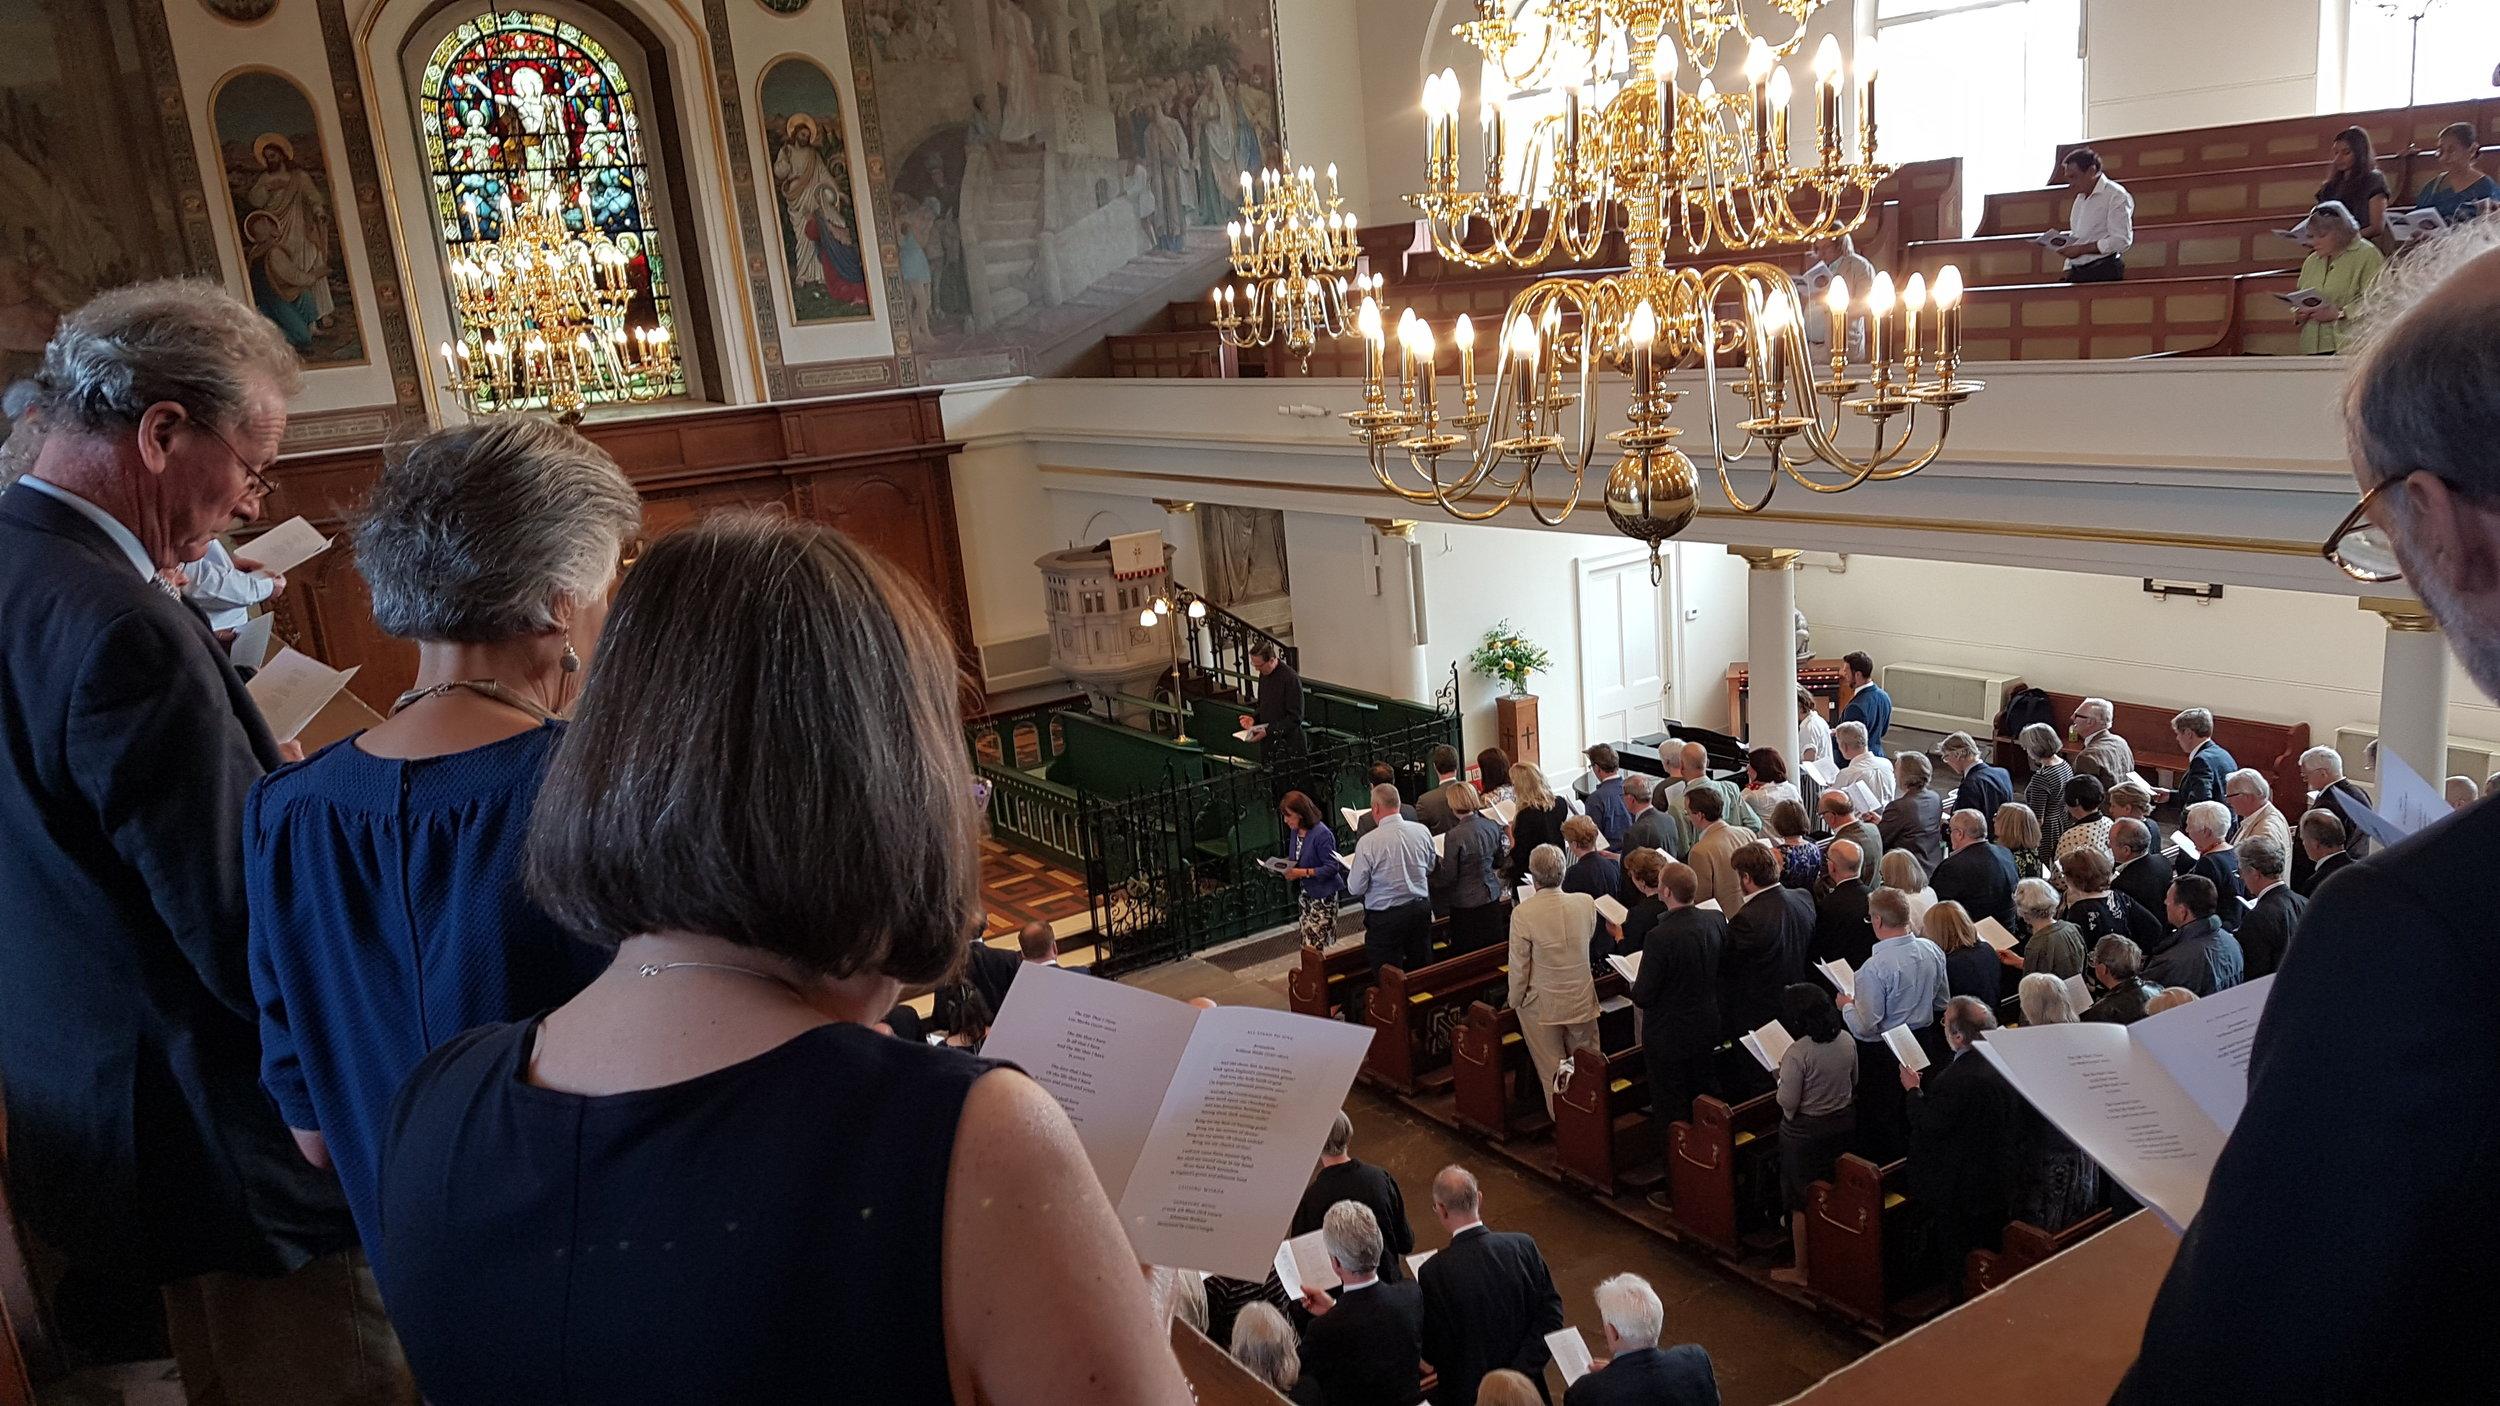 Tom Ryland Memorial Service 21st April 2018. St Peter's Church, Black Lion Lane. Hammersmith London .